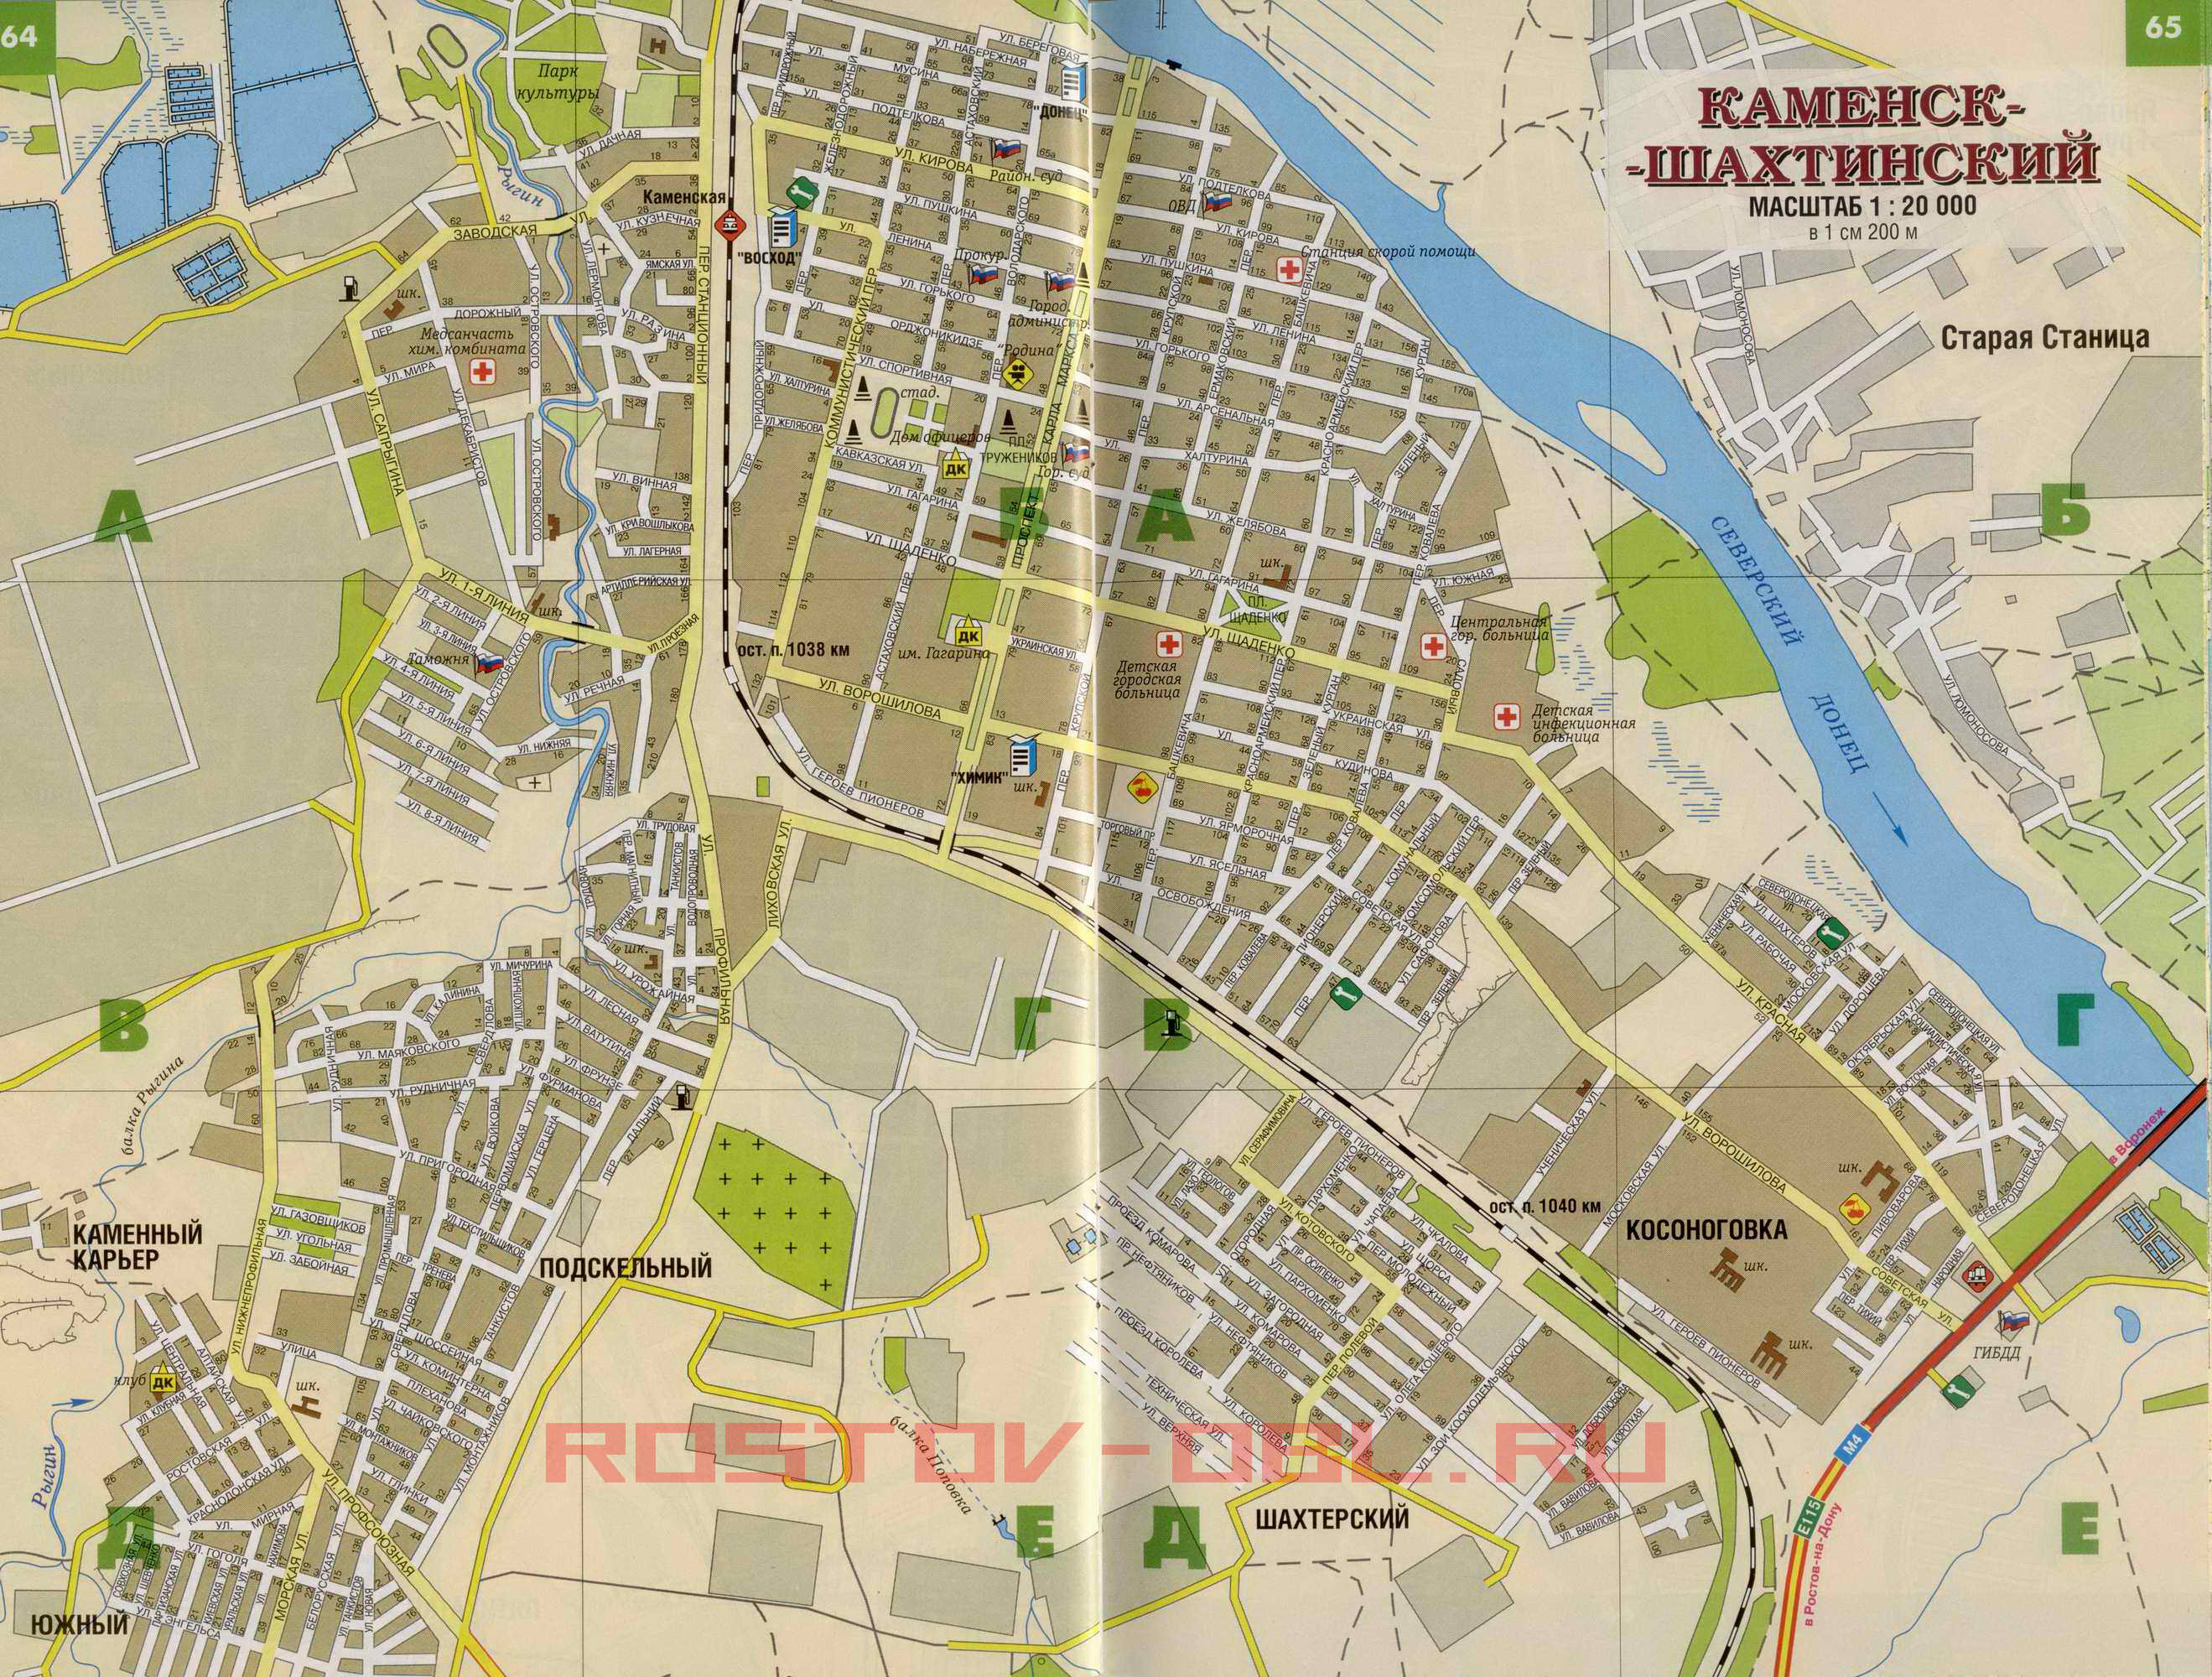 Каменск-Шахтинский. Карта города Каменск-Шахтинский ...: http://rf-town.ru/map978941_0_0.htm